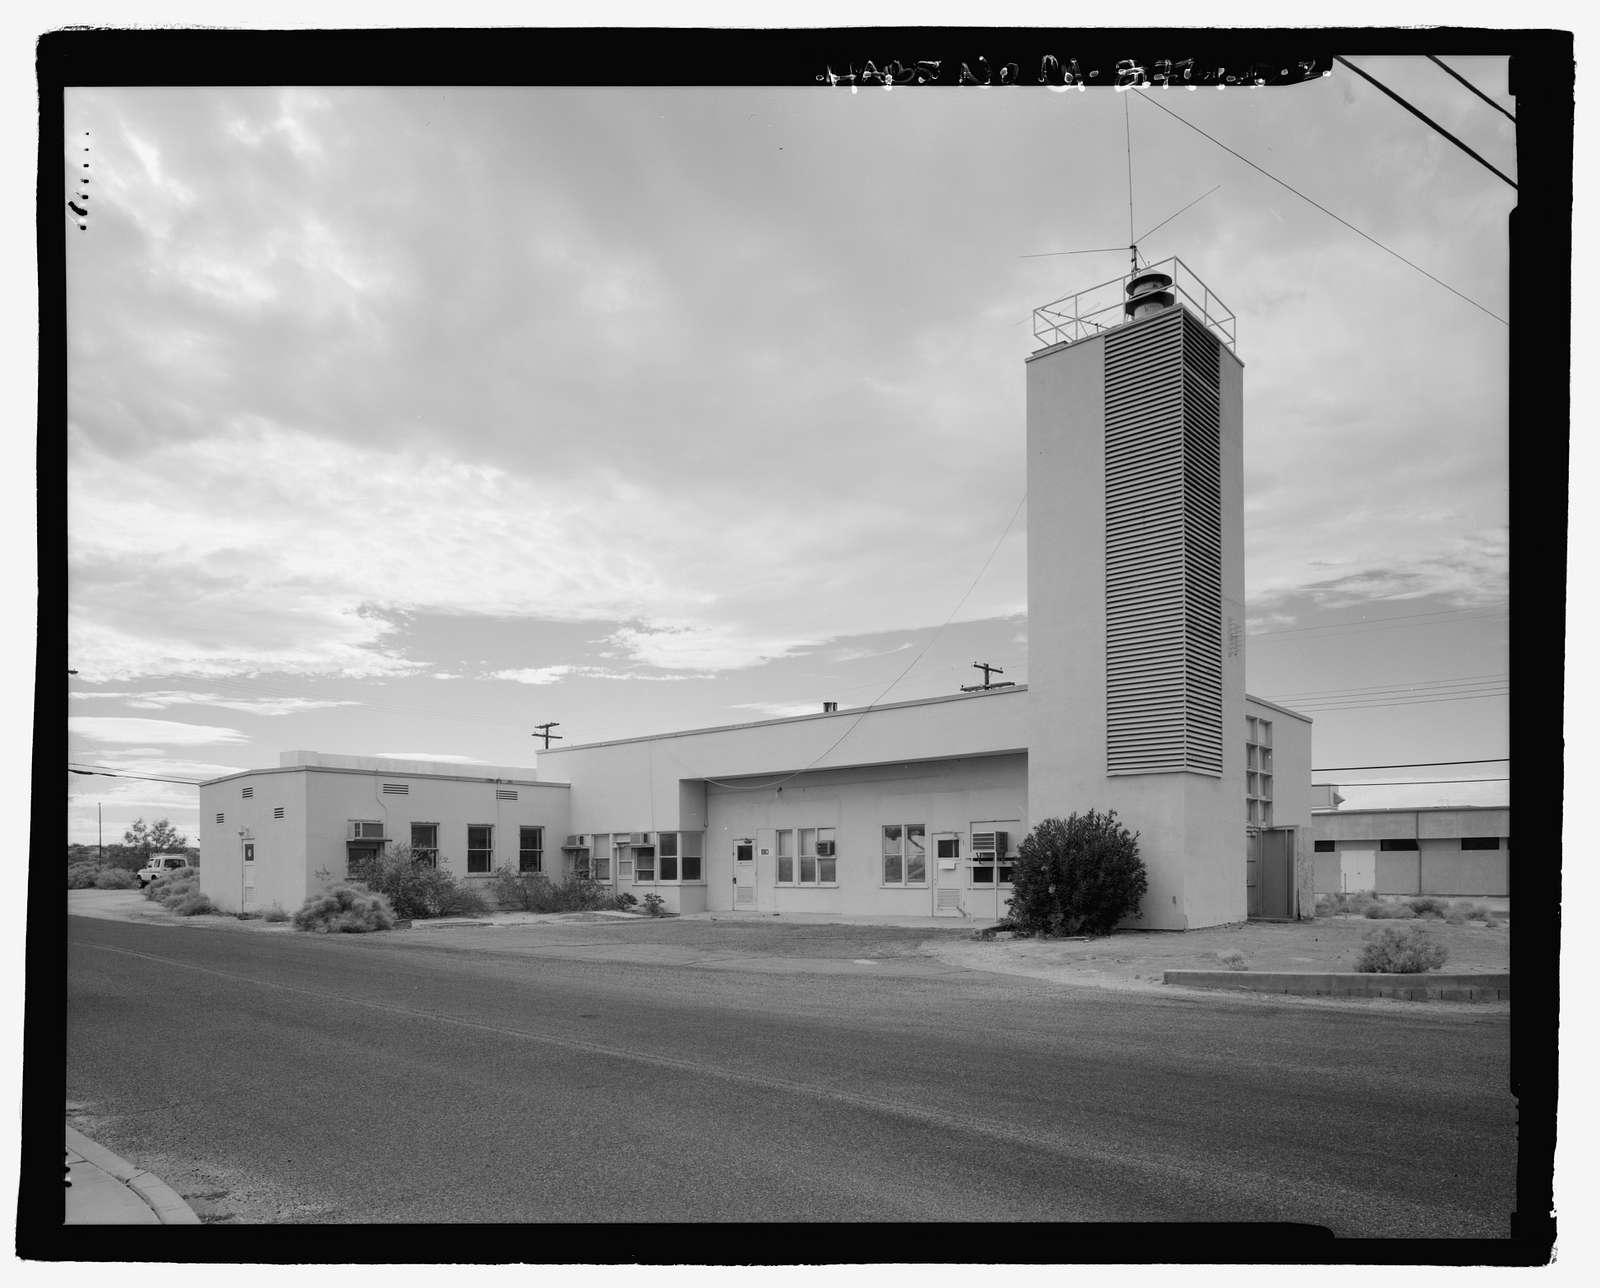 Naval Ordnance Test Station Inyokern, China Lake Pilot Plant, Fire Station & Marine Barracks, D Street, at corner of 4th Street, China Lake, Kern County, CA